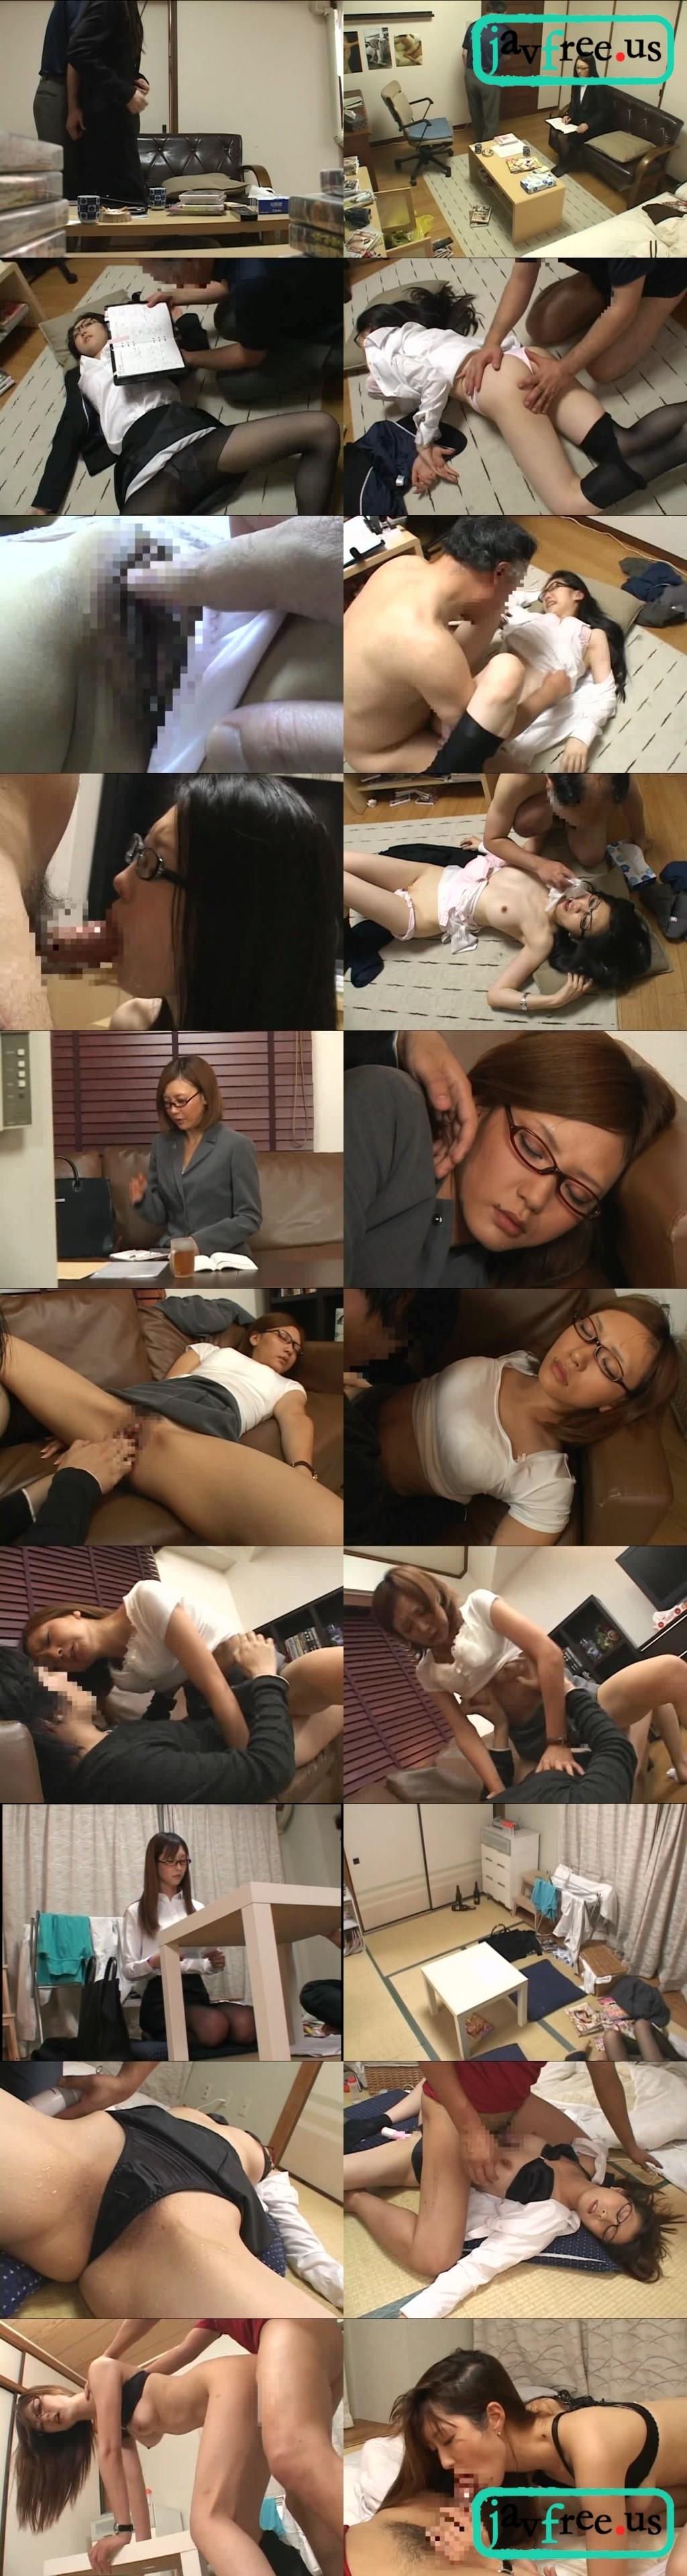 [NHDTA-185] 女弁護士を薬で眠らせている間にハメたら目覚めた瞬間!!!感じまくって焦った - image NHDTA185 on https://javfree.me